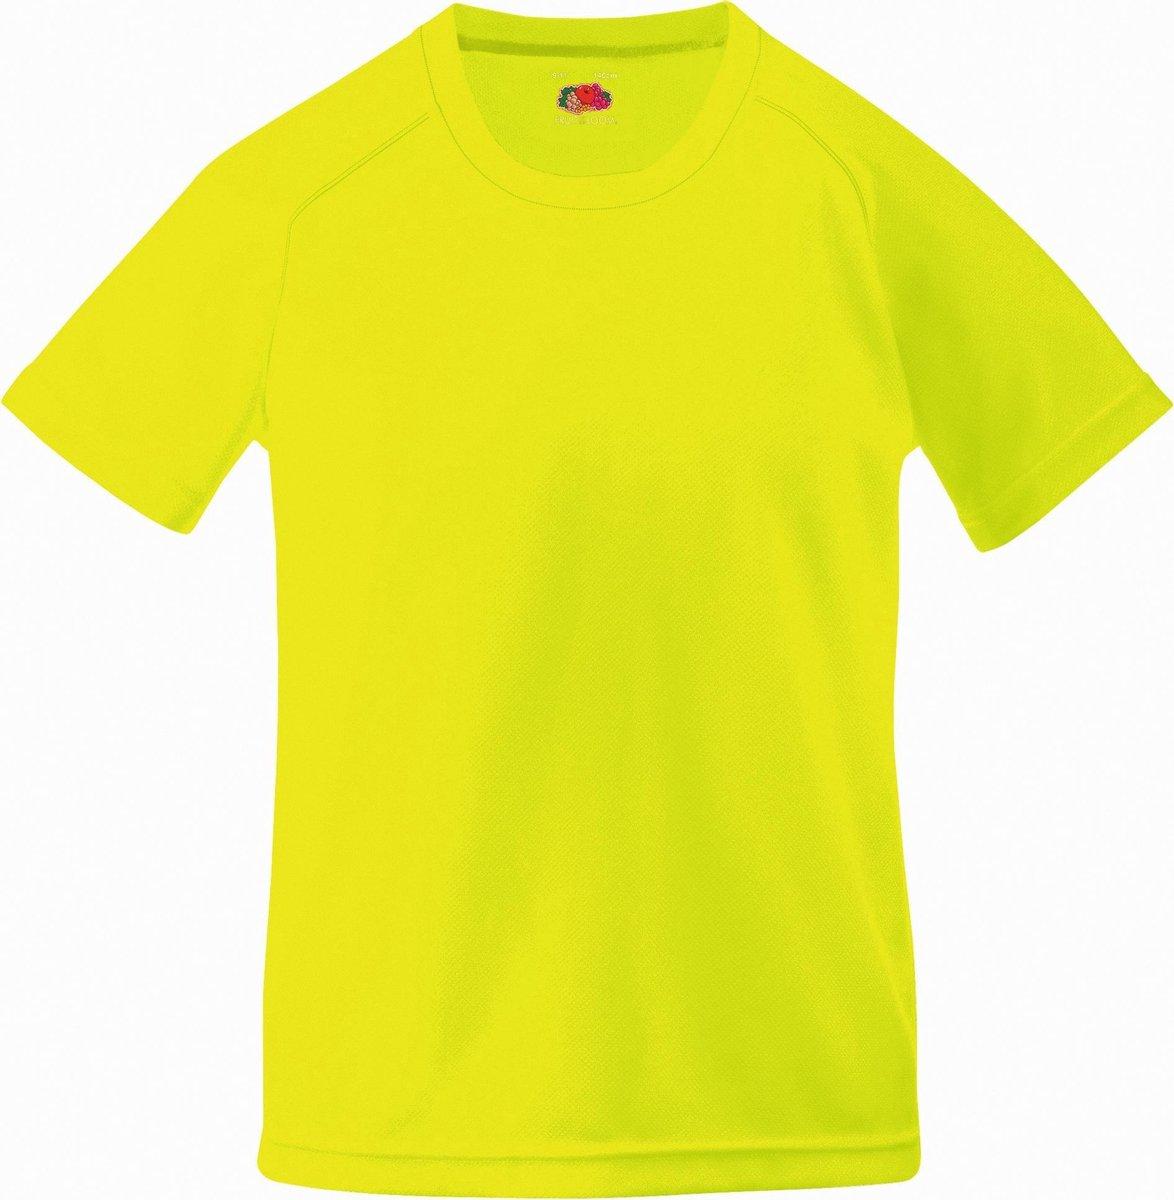 Fruit Of The Loom Kinderen Unisex Prestatie Sportskleding T-Shirt (2 stuks) (Bright Yellow)